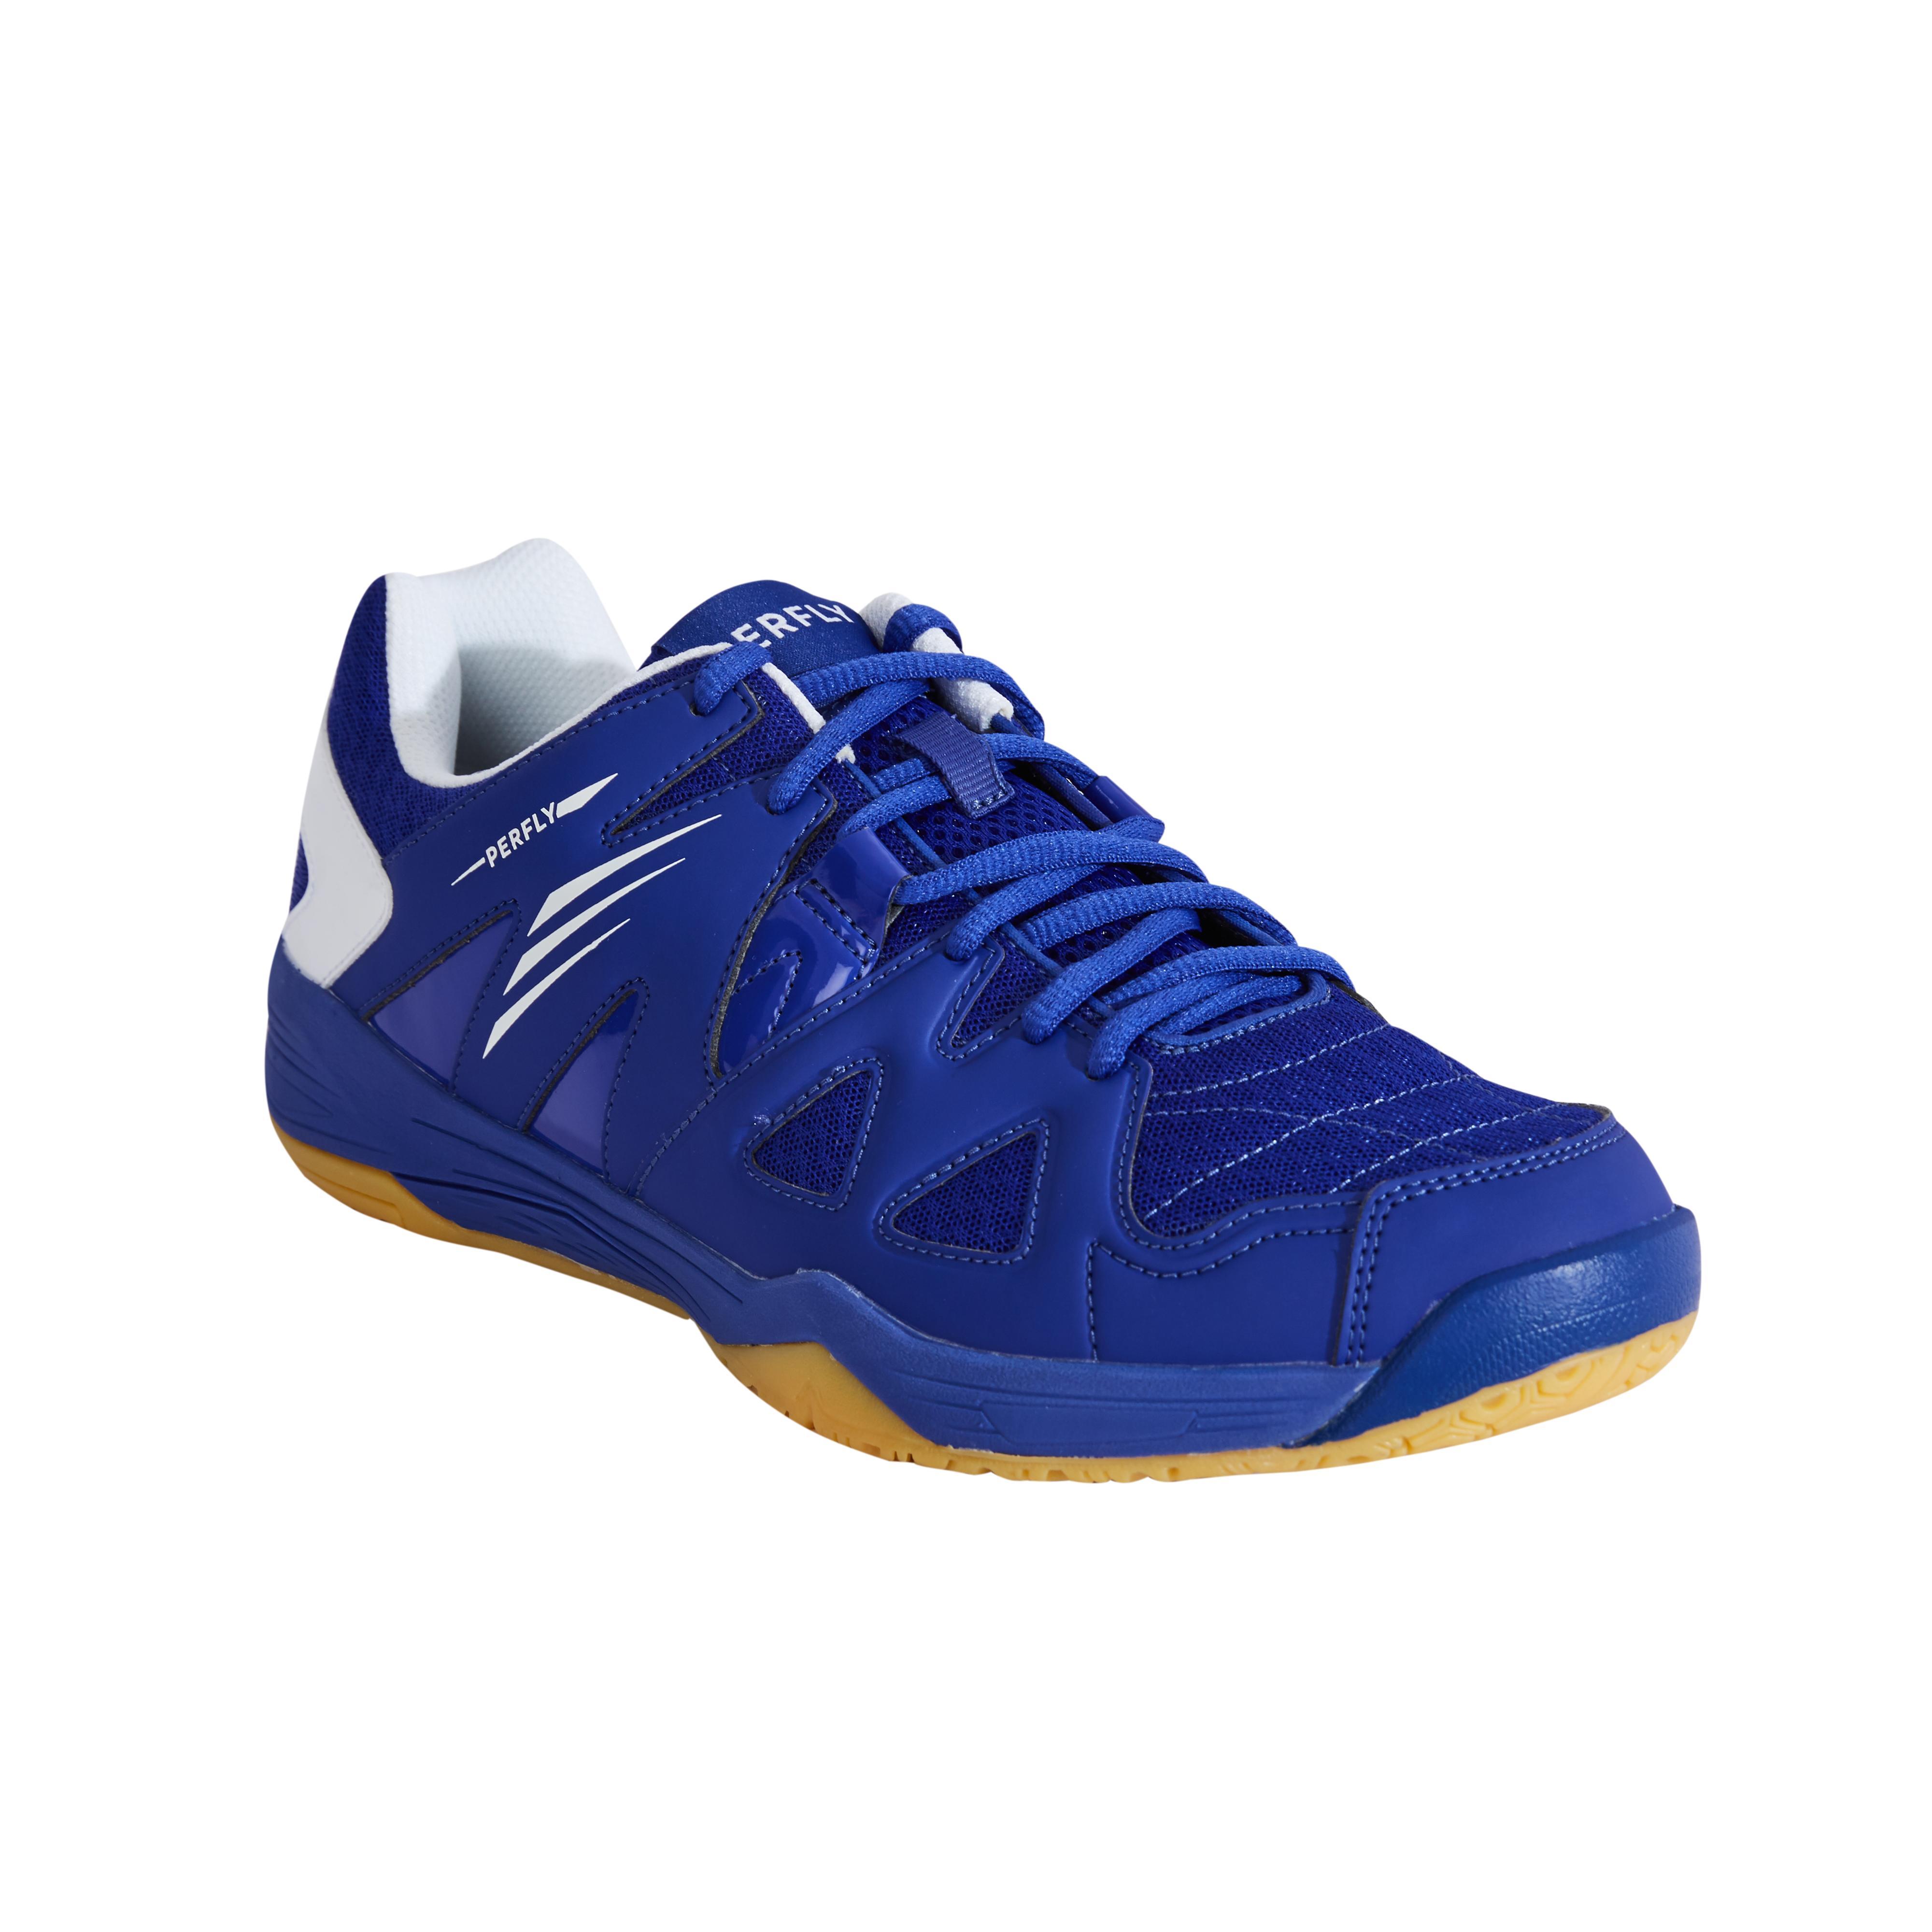 PERFLY Chaussures De Badminton pour Homme BS530 - Bleu - PERFLY - 44